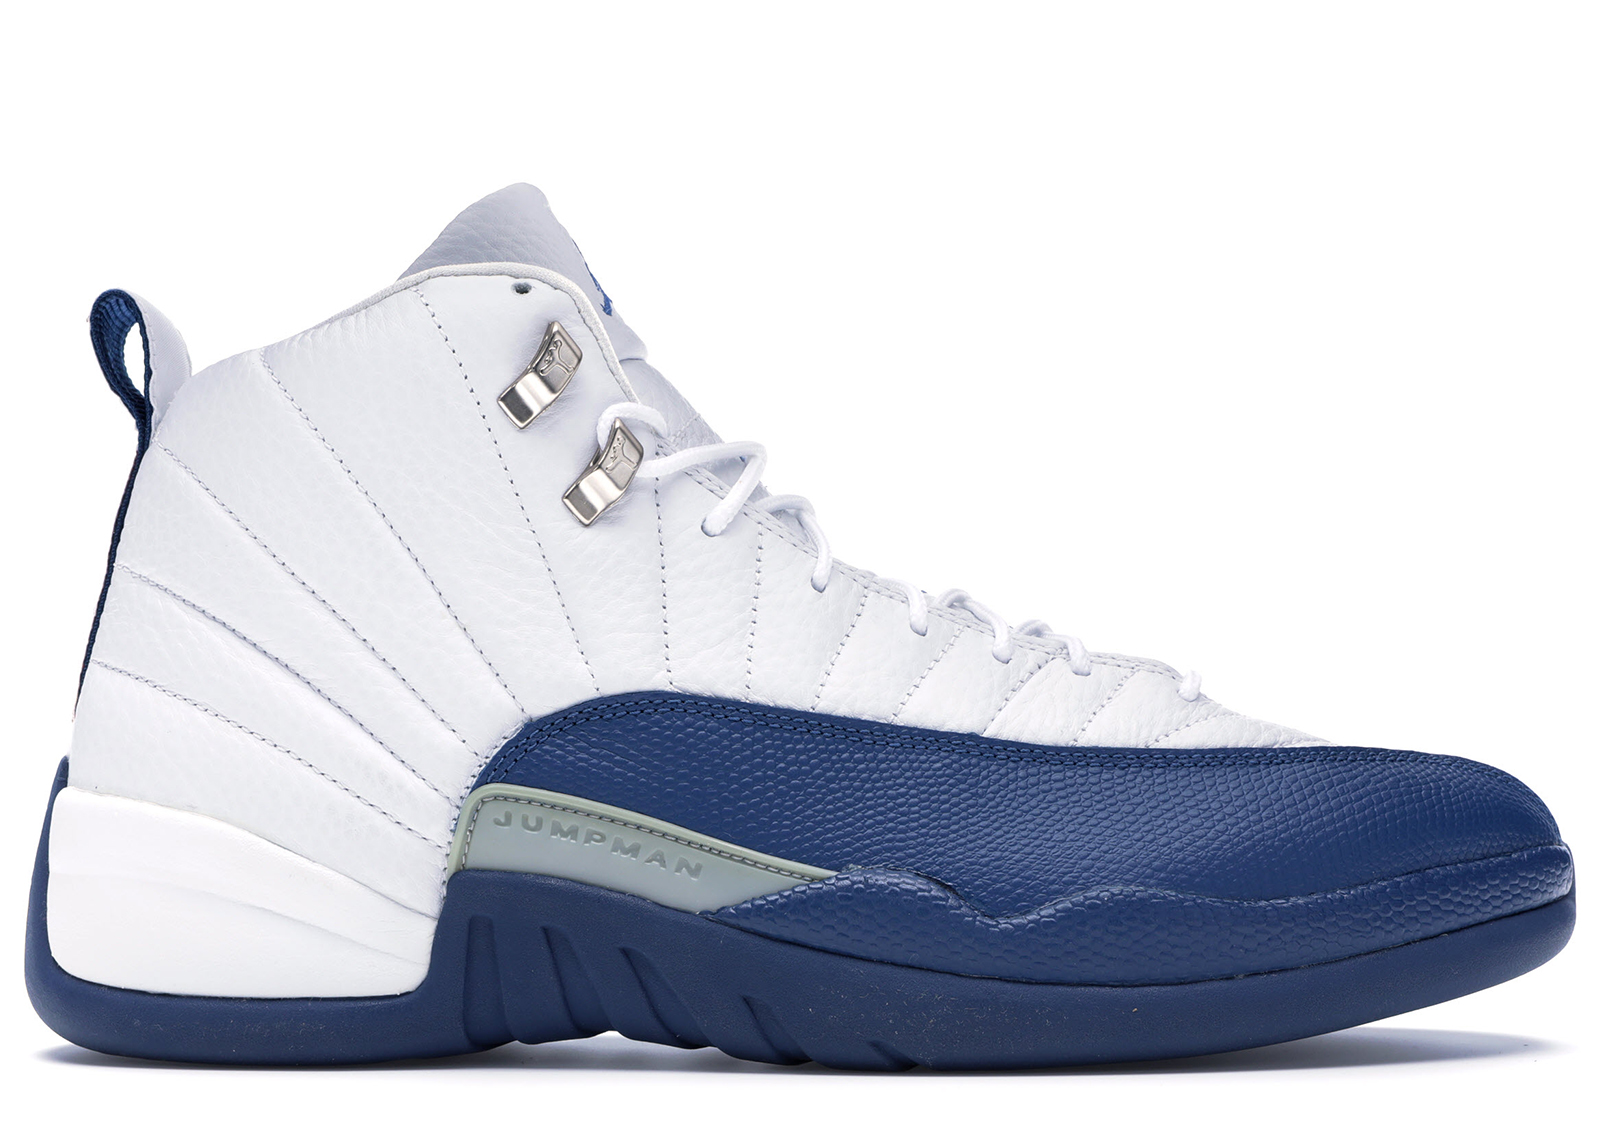 Jordan 12 Retro French Blue (2004